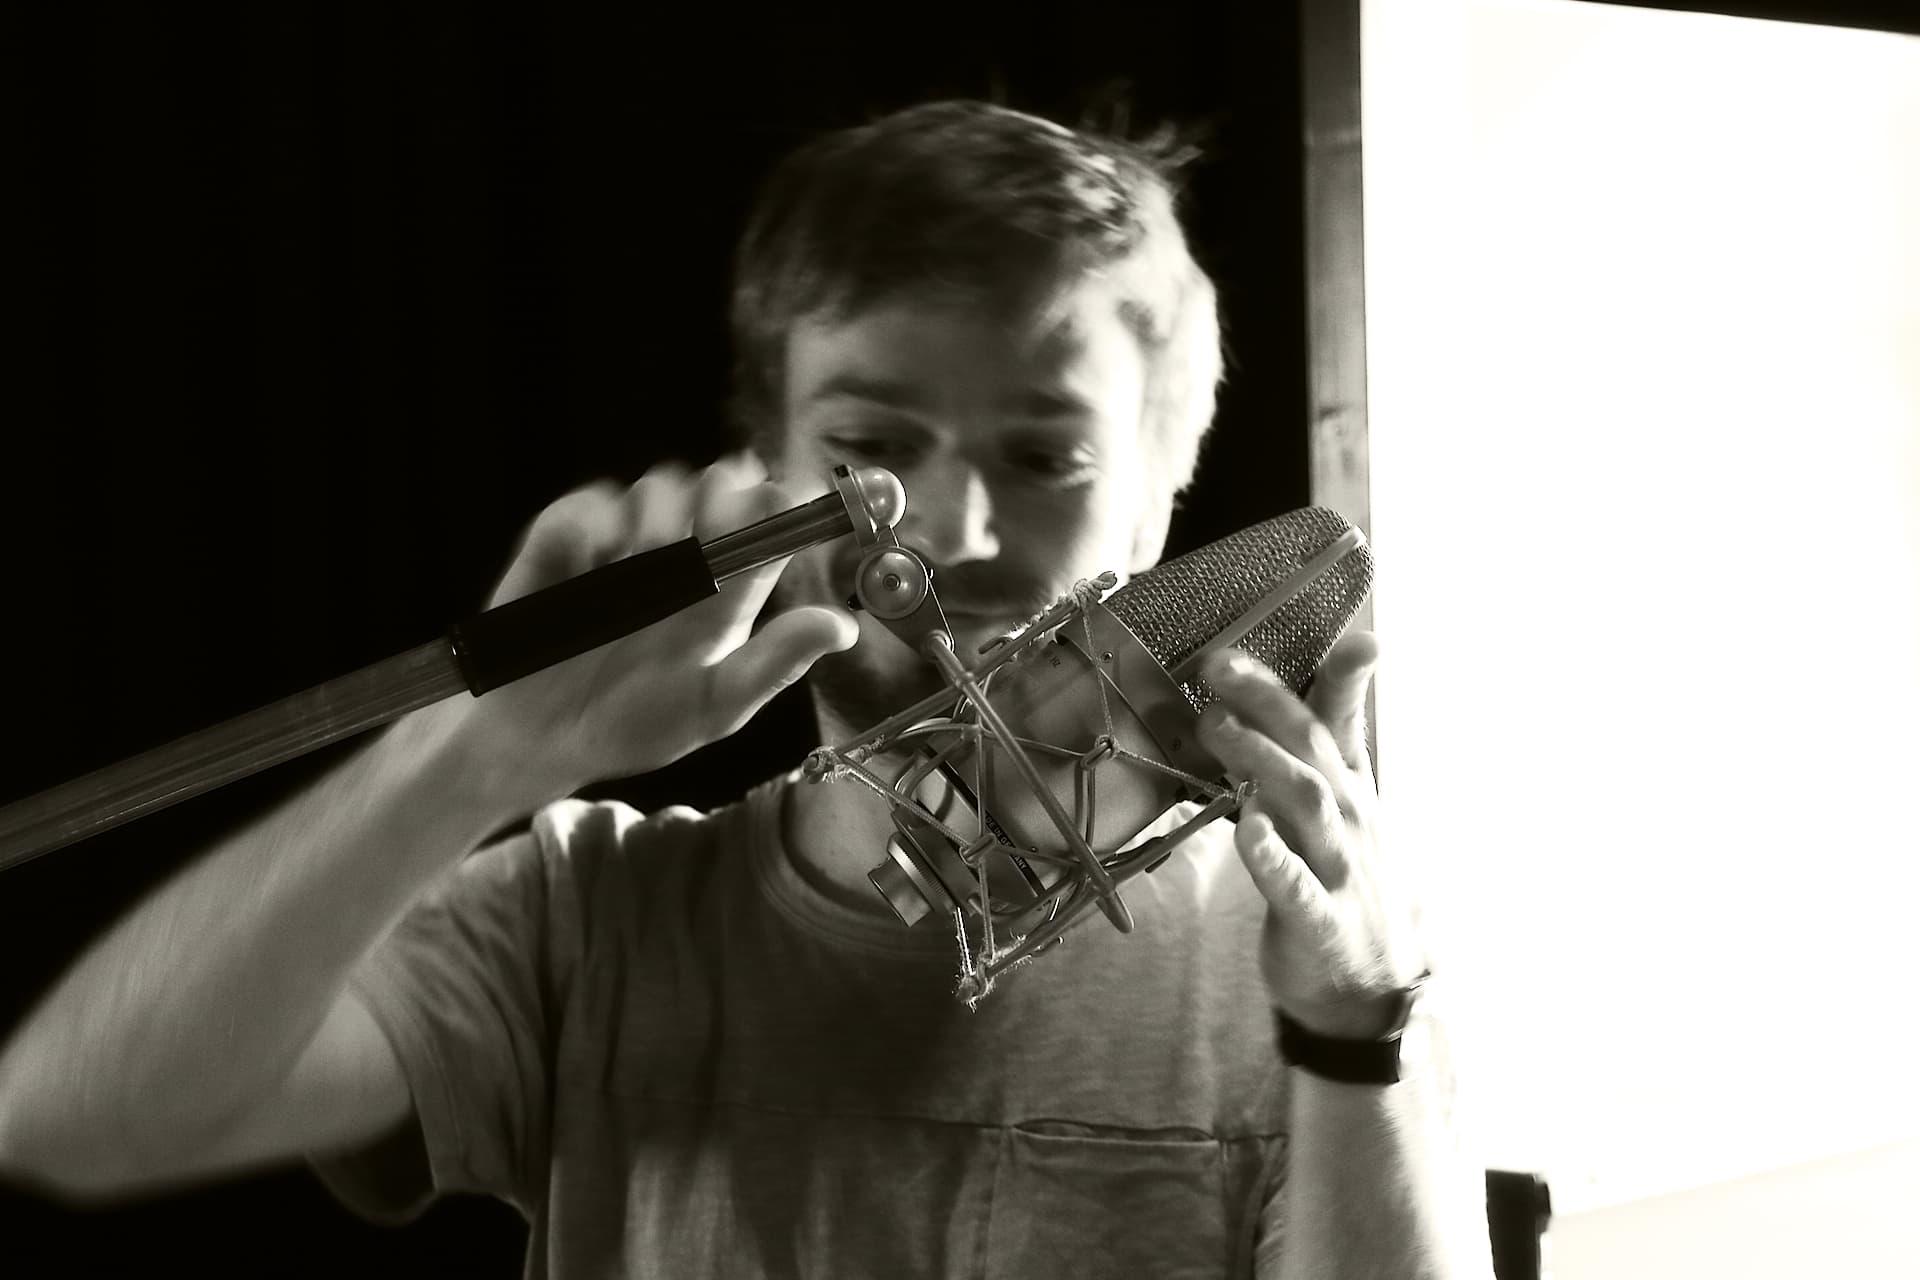 Engineer Dieter Boels with a Microphone